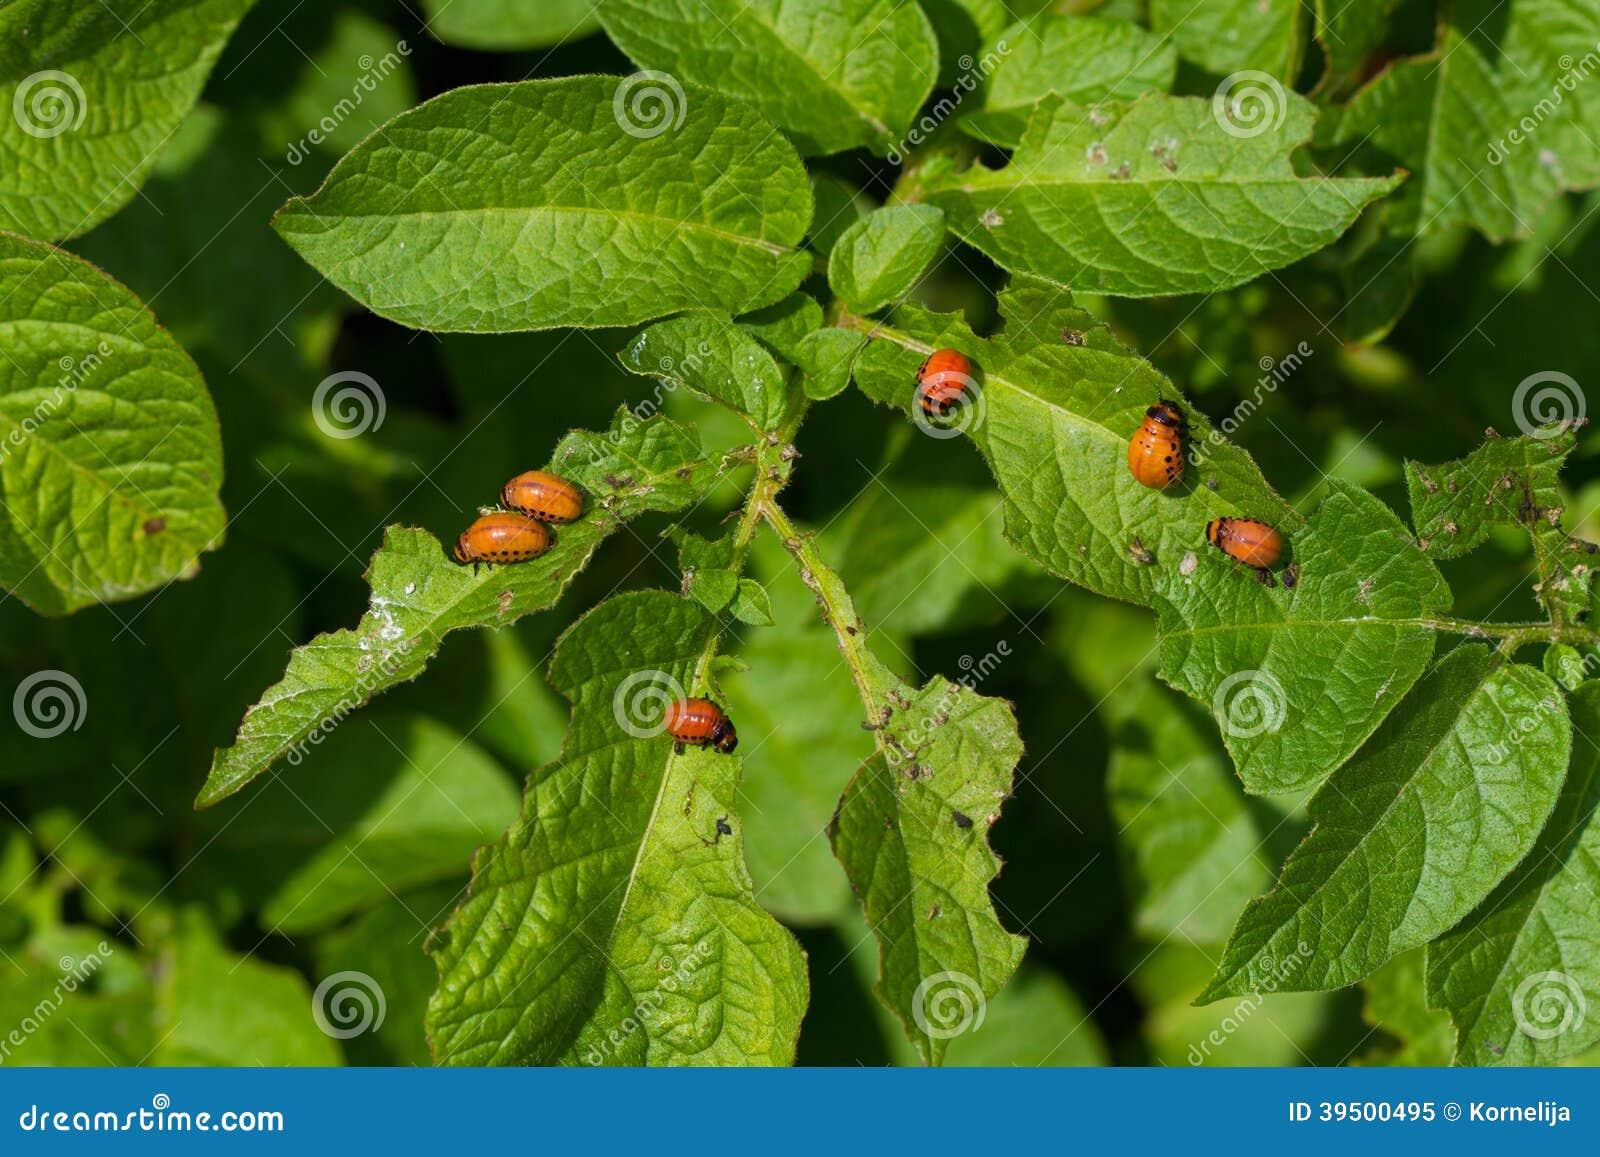 Colorado beetle larvas